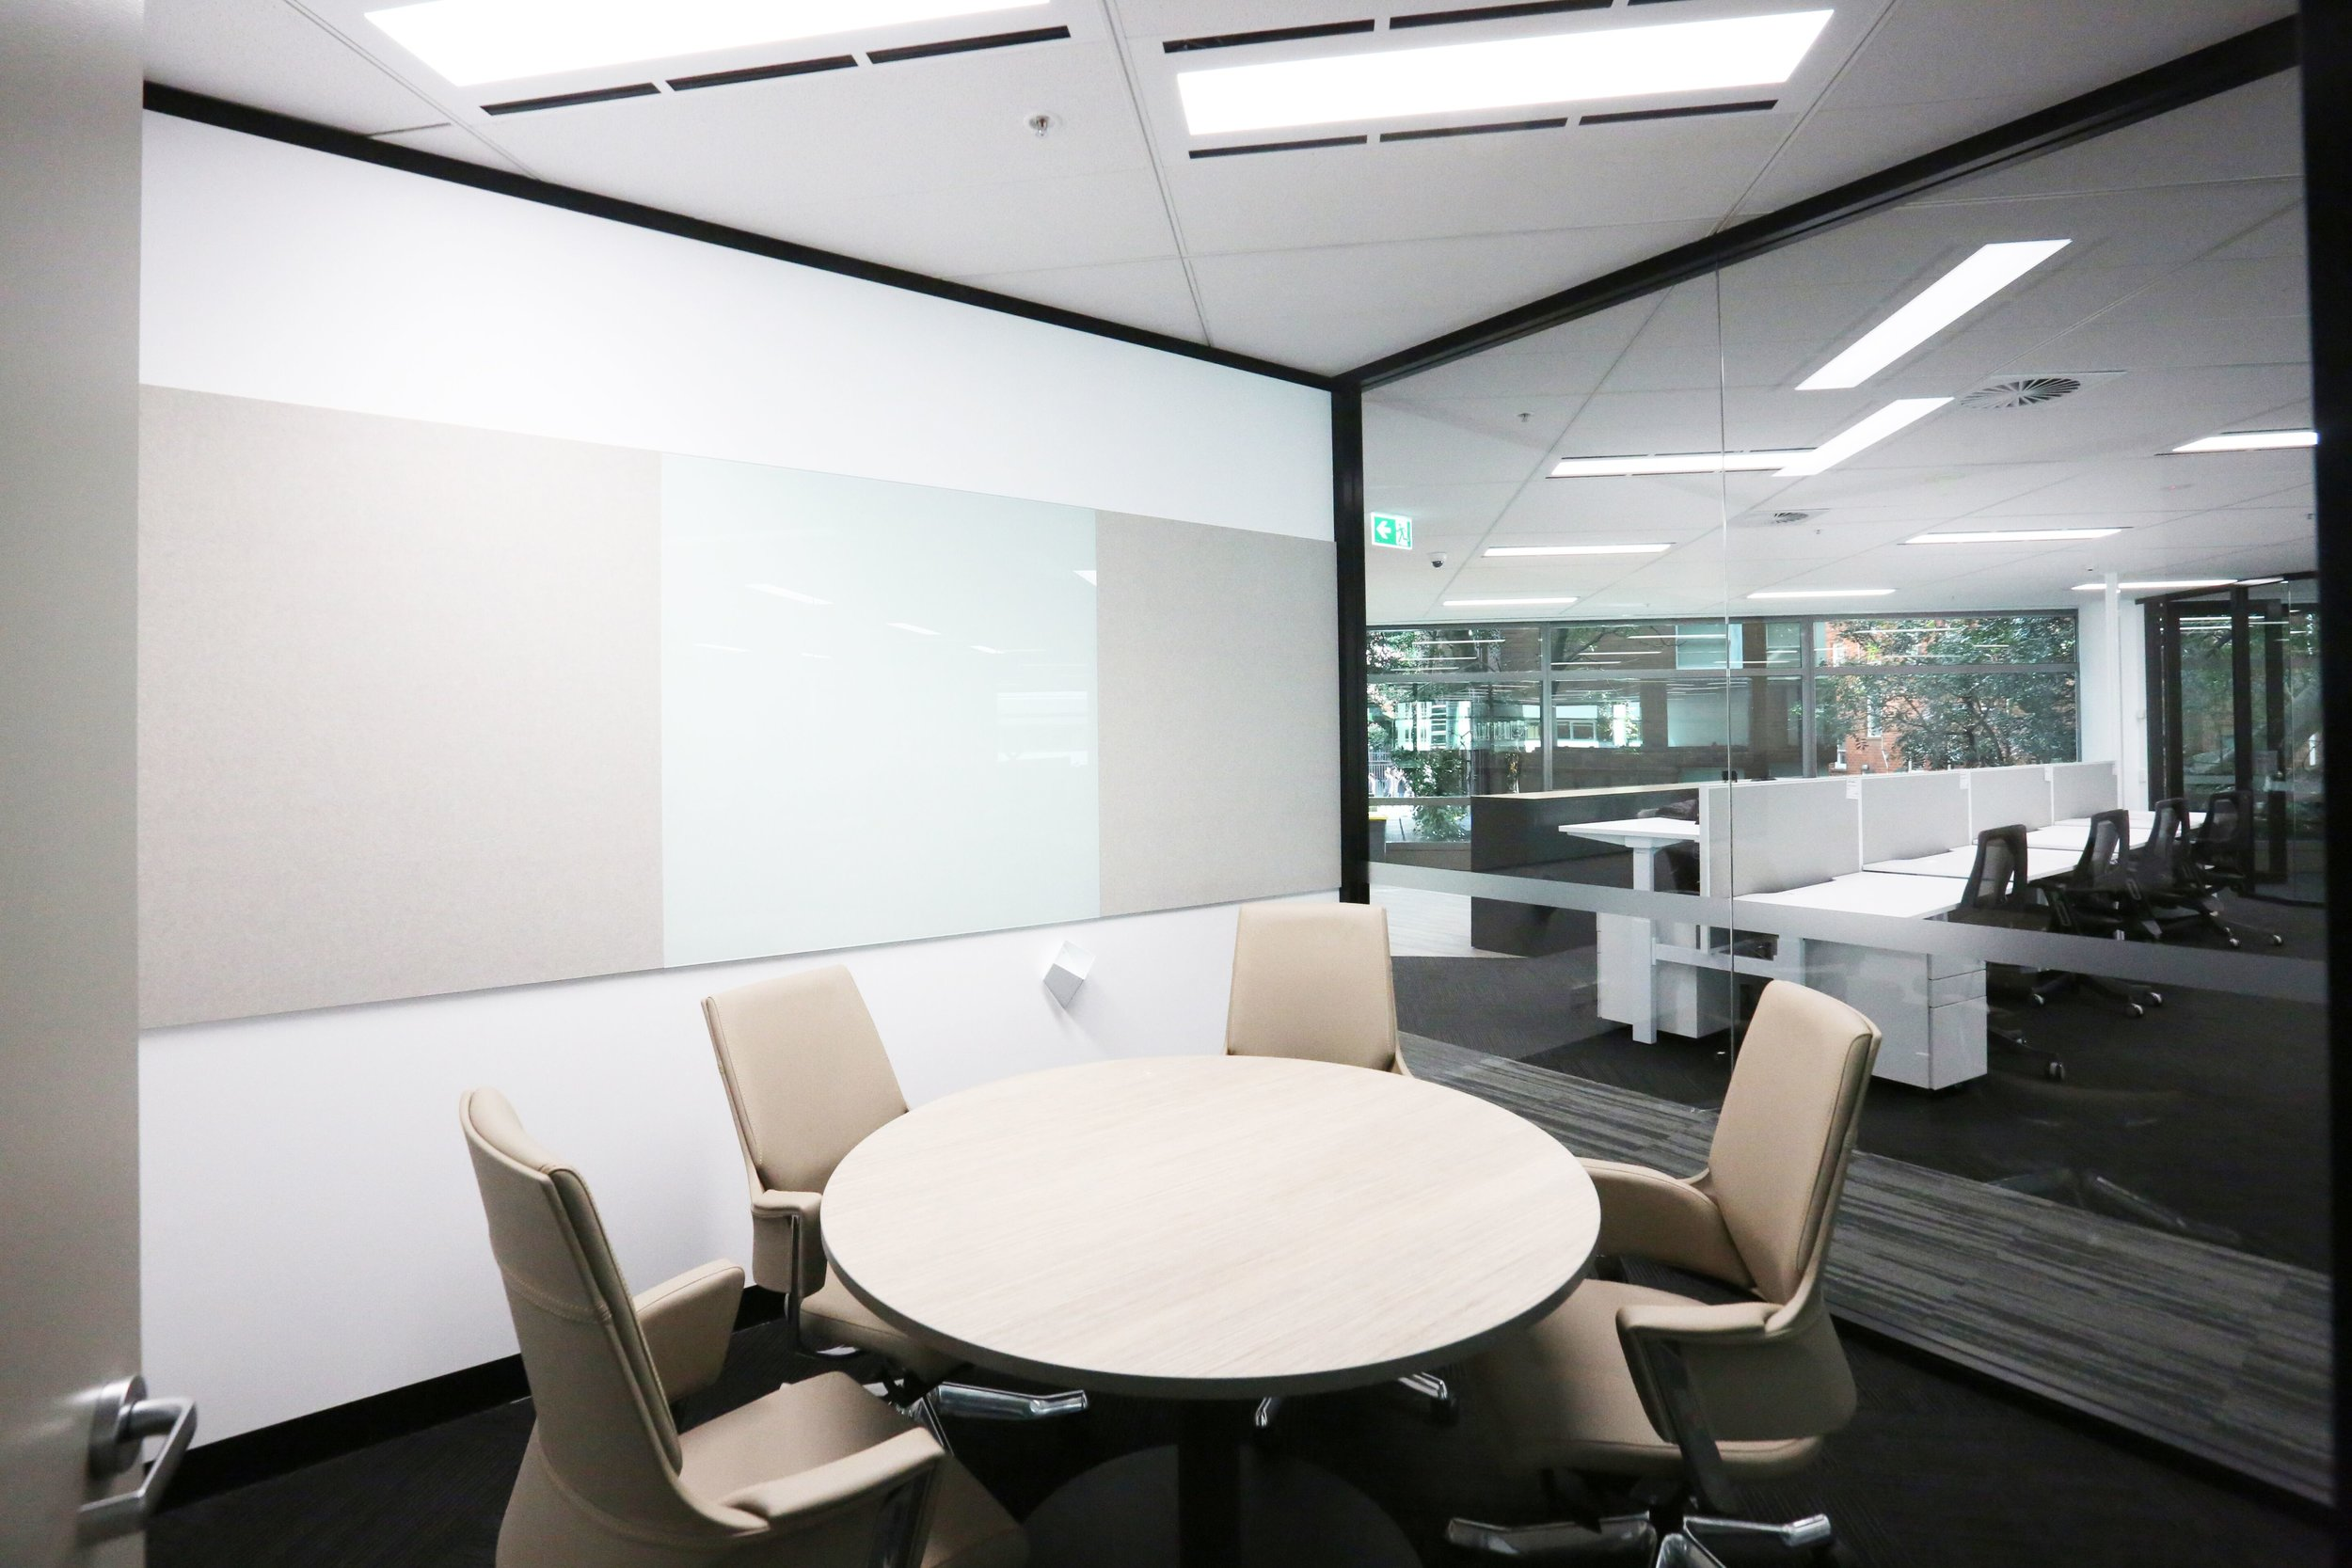 SMI National_Meeting Room_Staff Area.jpg